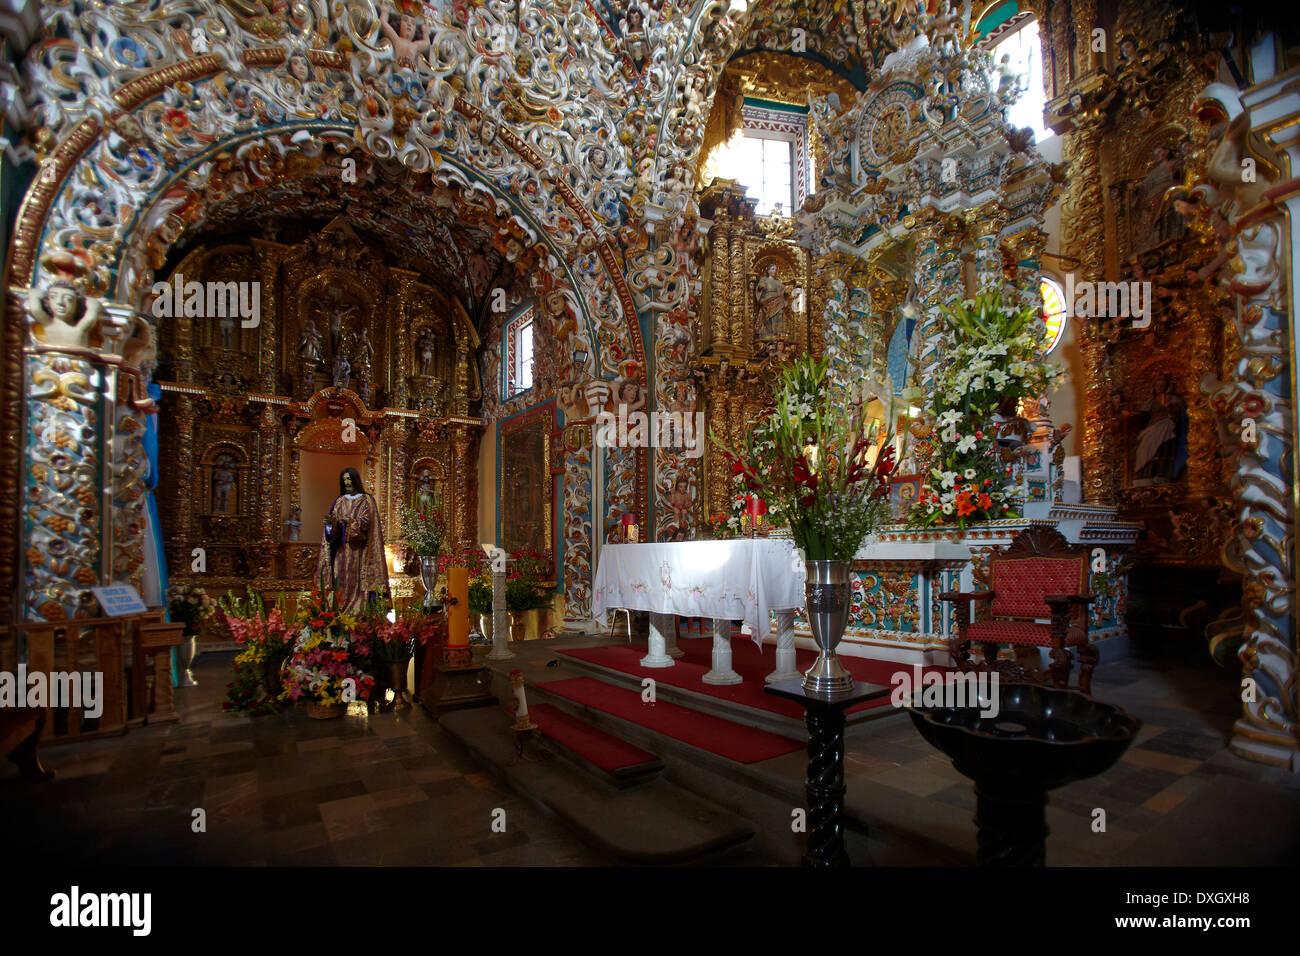 América, Mexico, Puebla state, Tonantzintla village, Santa María church inside Stock Photo